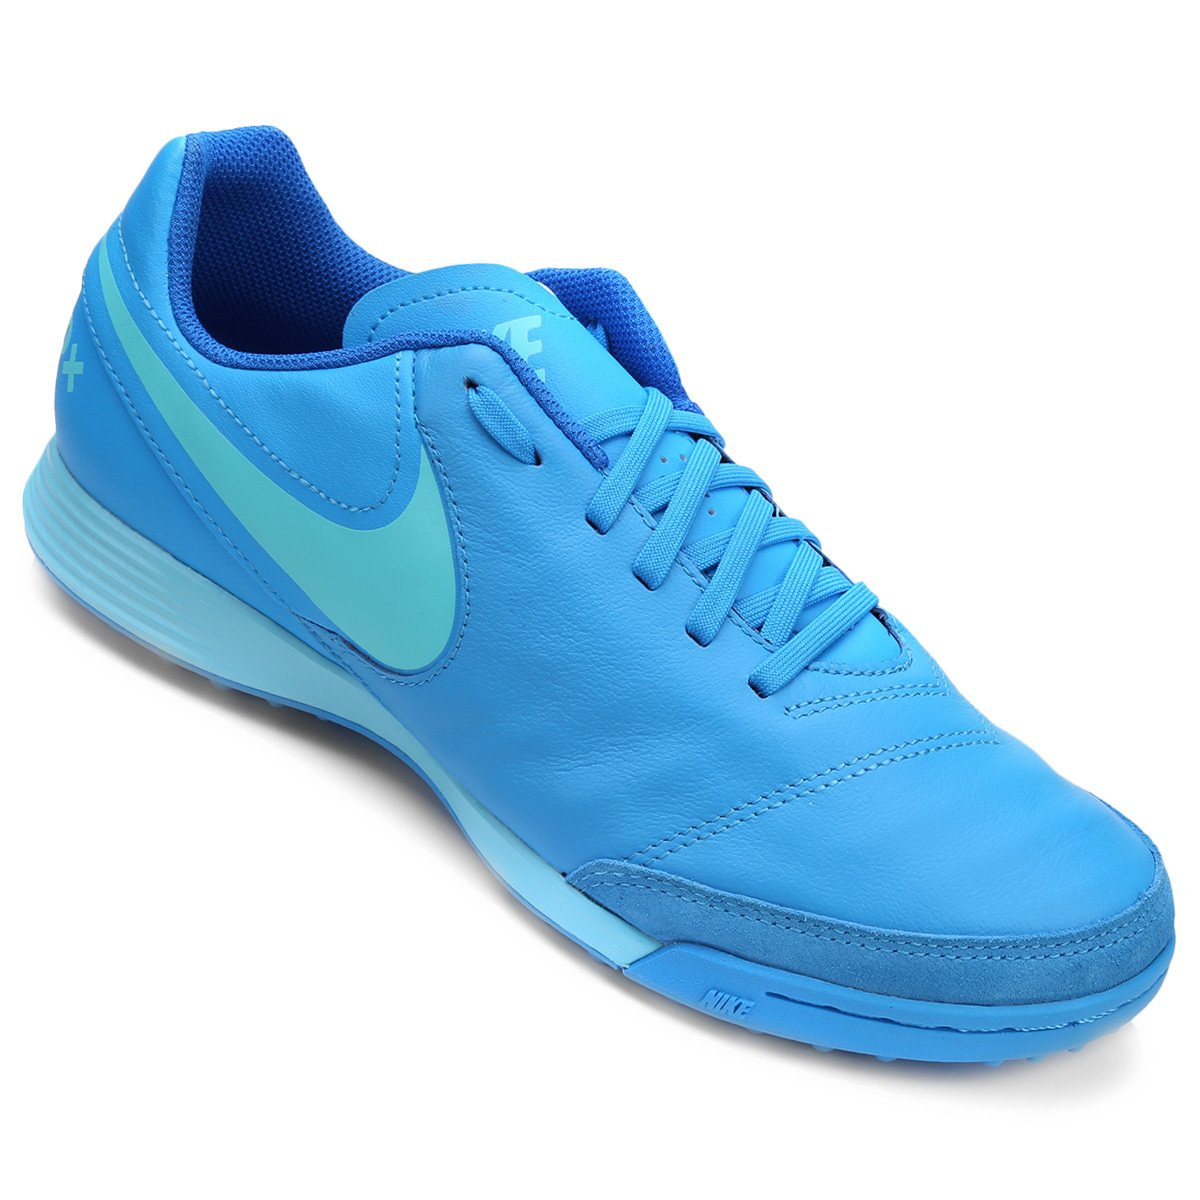 Chuteira Society Nike Tiempo Genio 2 Leather TF - Azul Piscina ... 7ba44c95f8538